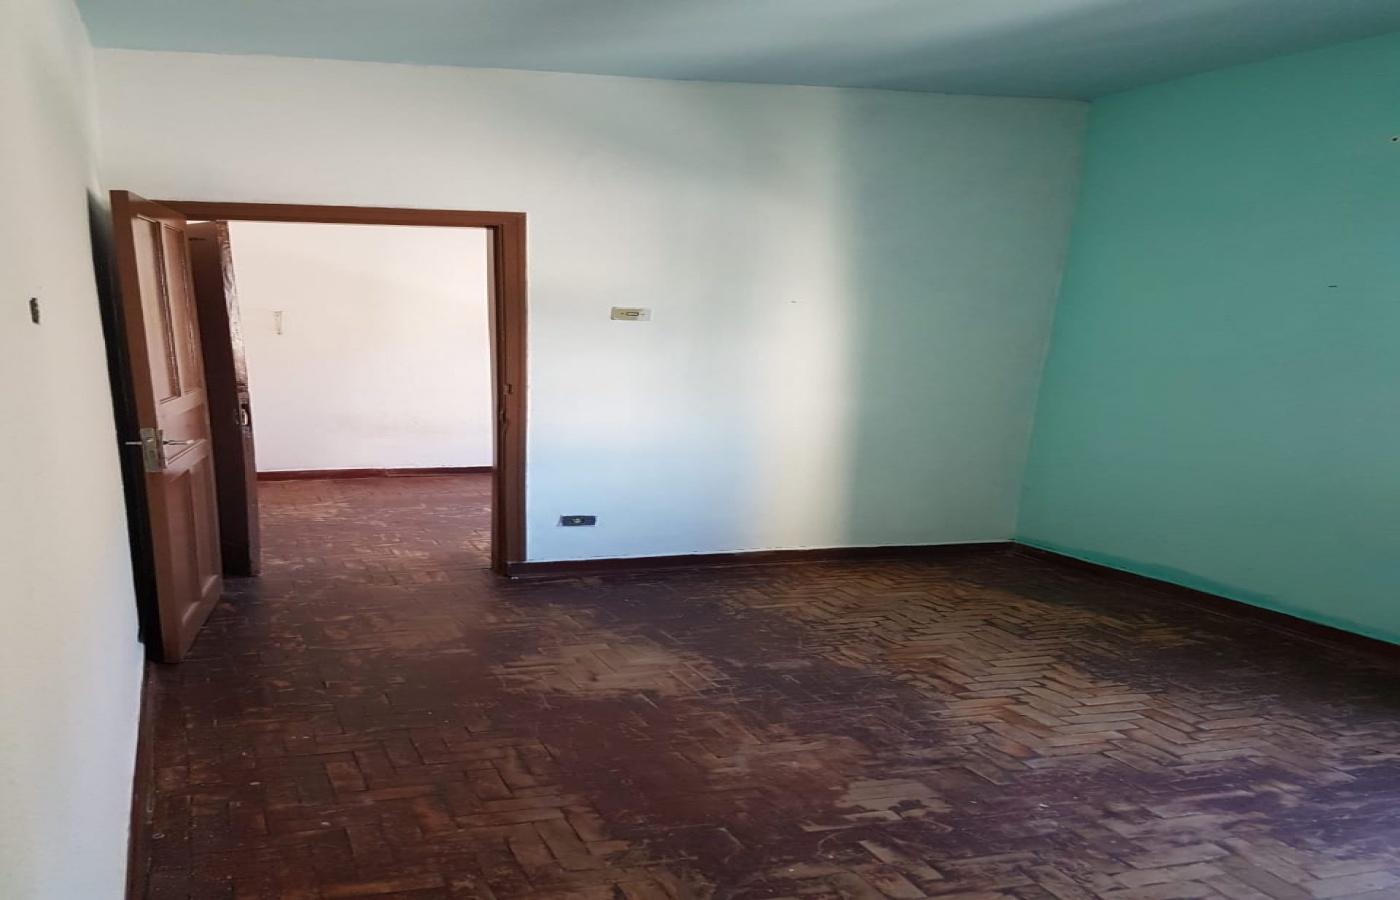 Rua Itinguçu Fundos, 03658-001, São Paulo, 2 Bedrooms Bedrooms, ,1 BathroomBathrooms,Casa em Condomínio,Locações,Rua Itinguçu,1023